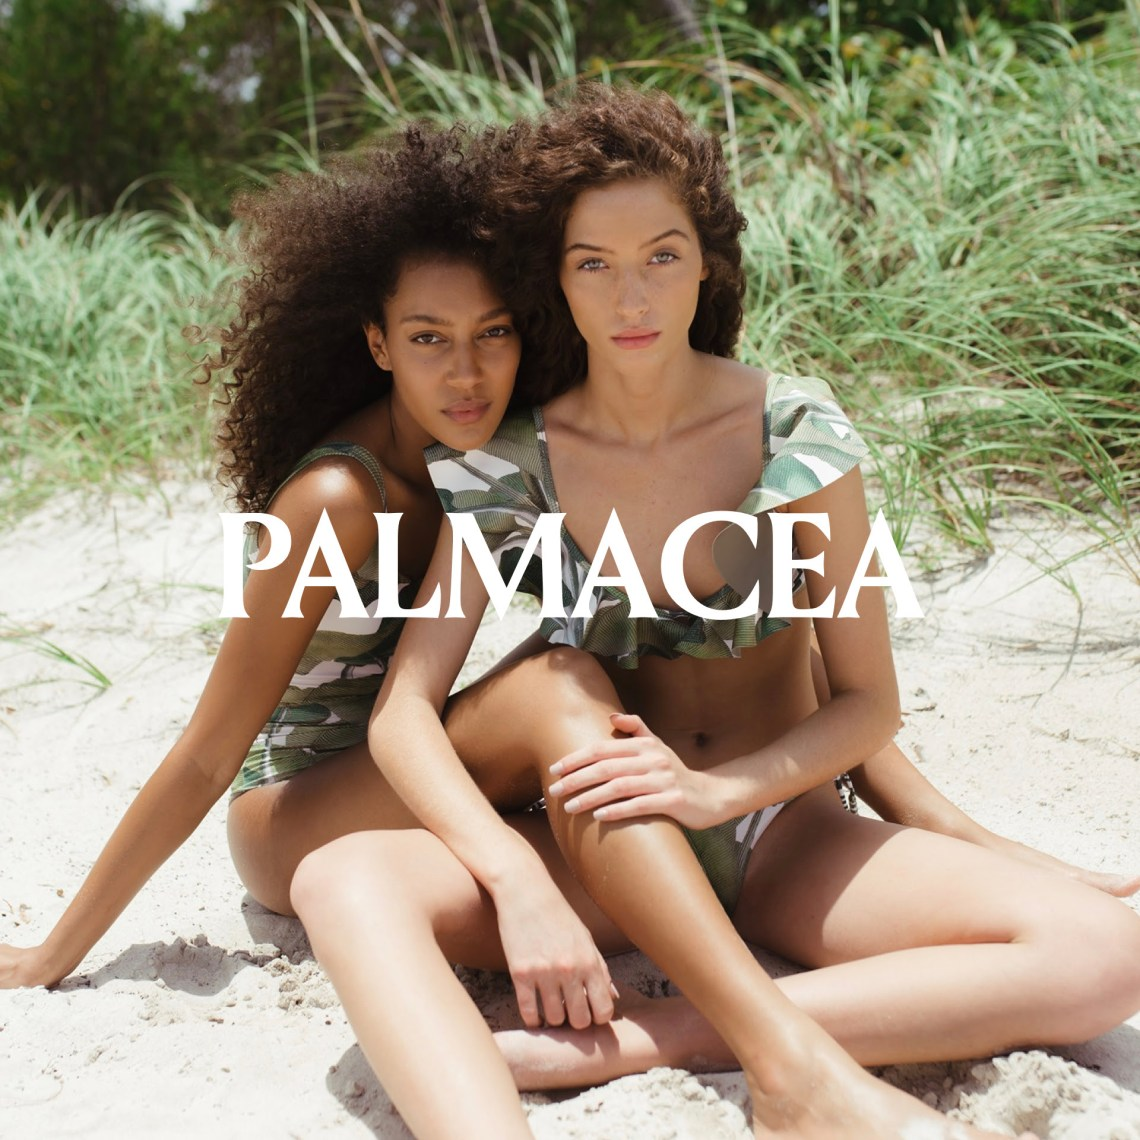 PAMACEA